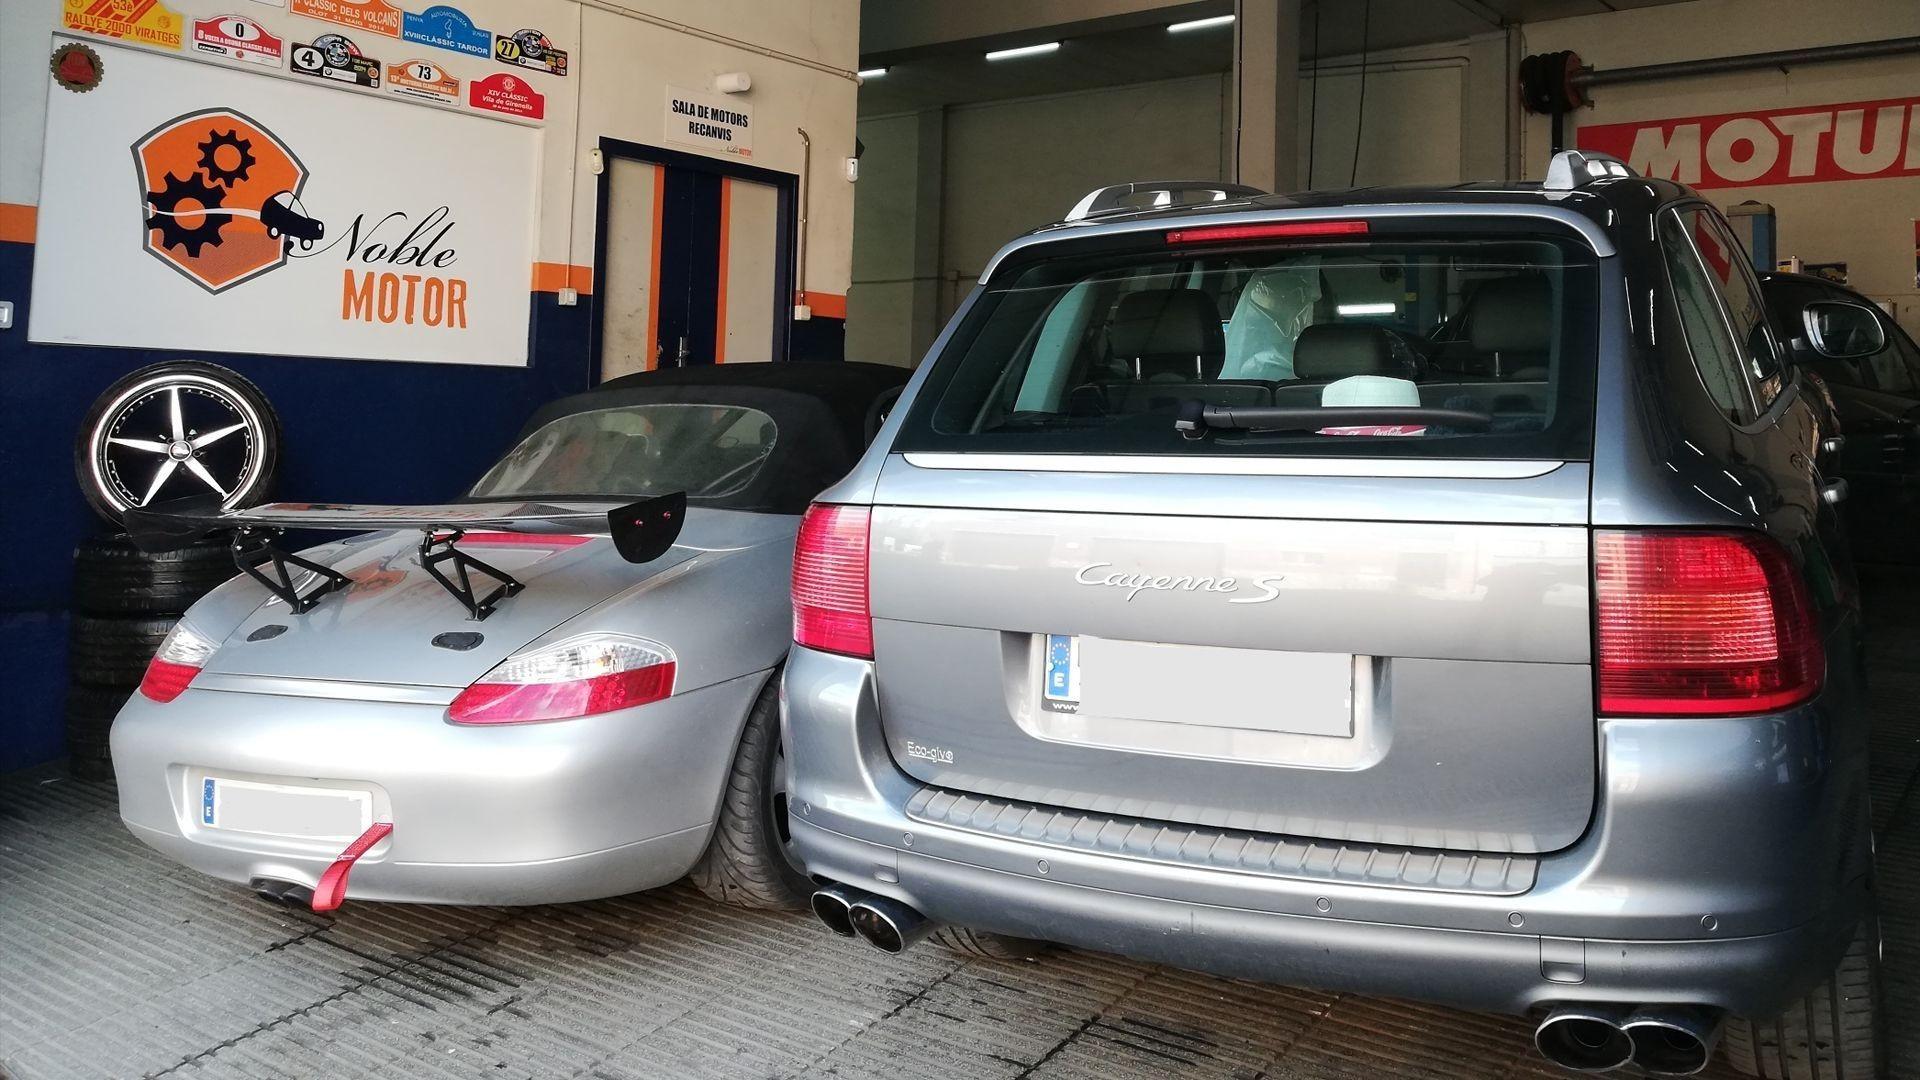 Taller de automóviles en Barcelona